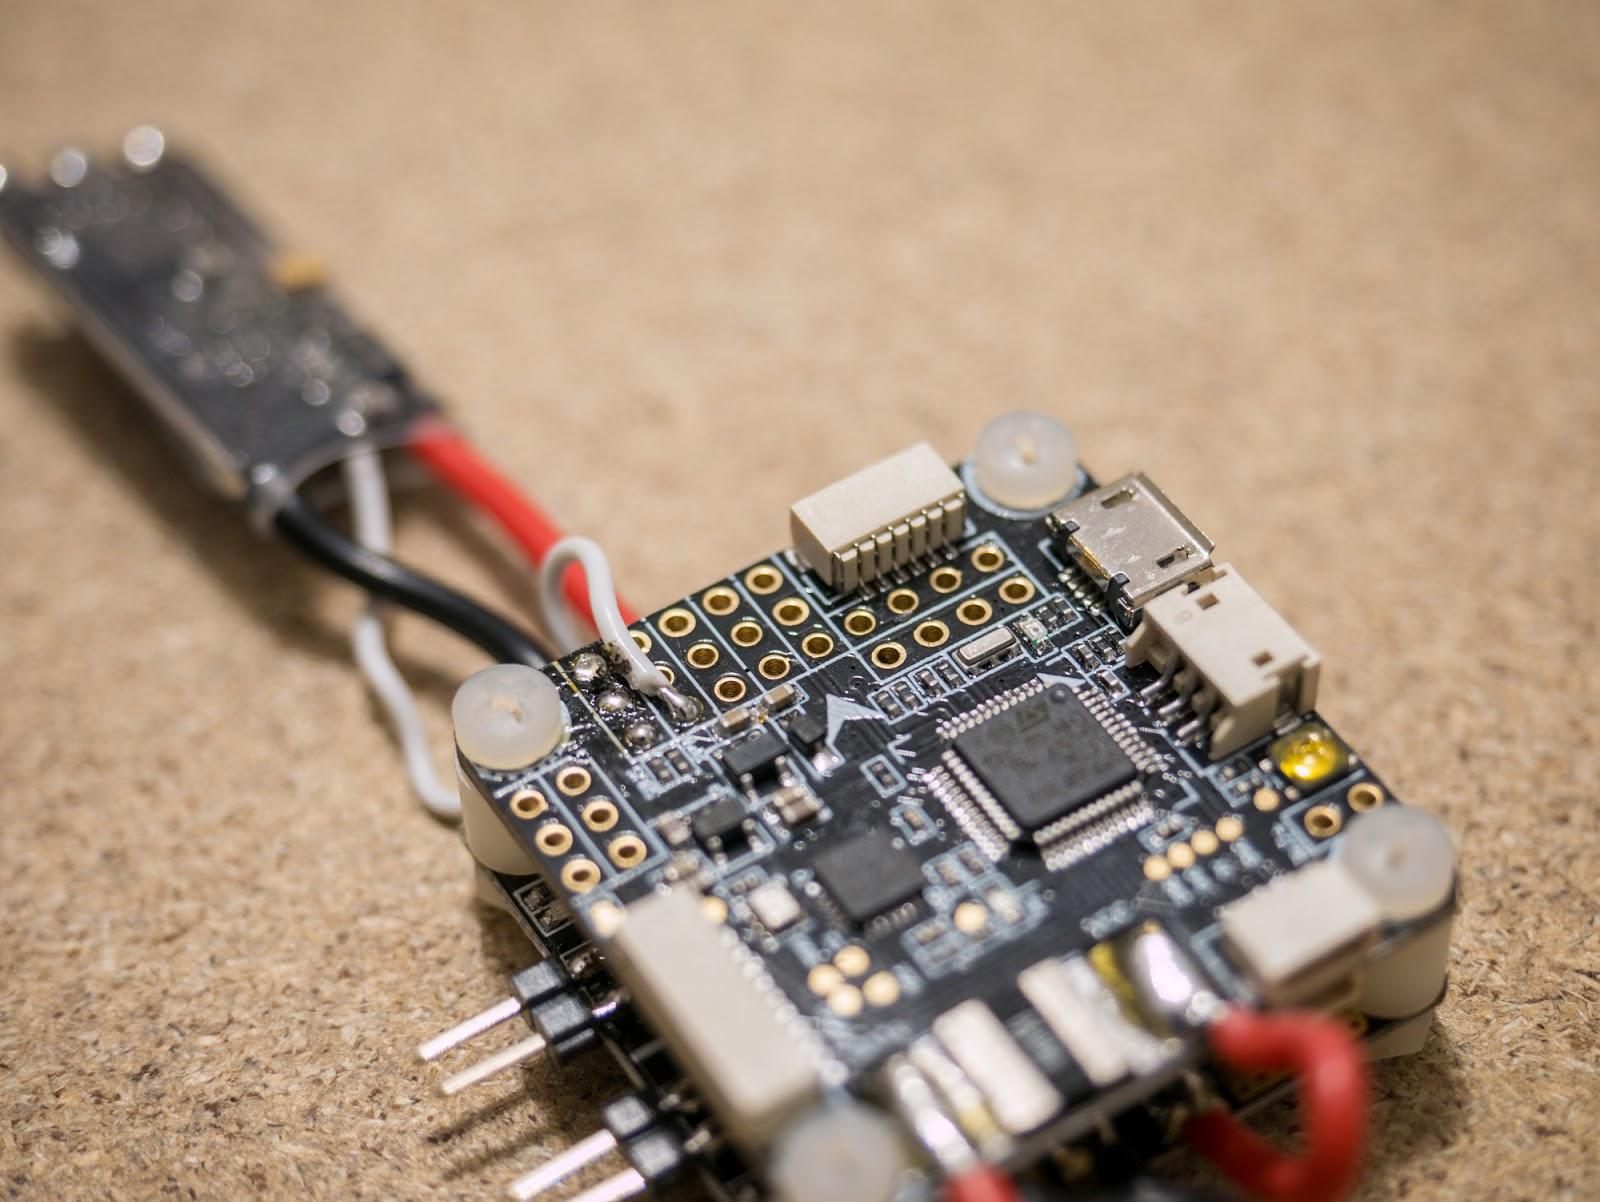 ZOHD Nano Talon 860mm - full review / build log / mods - Page 3